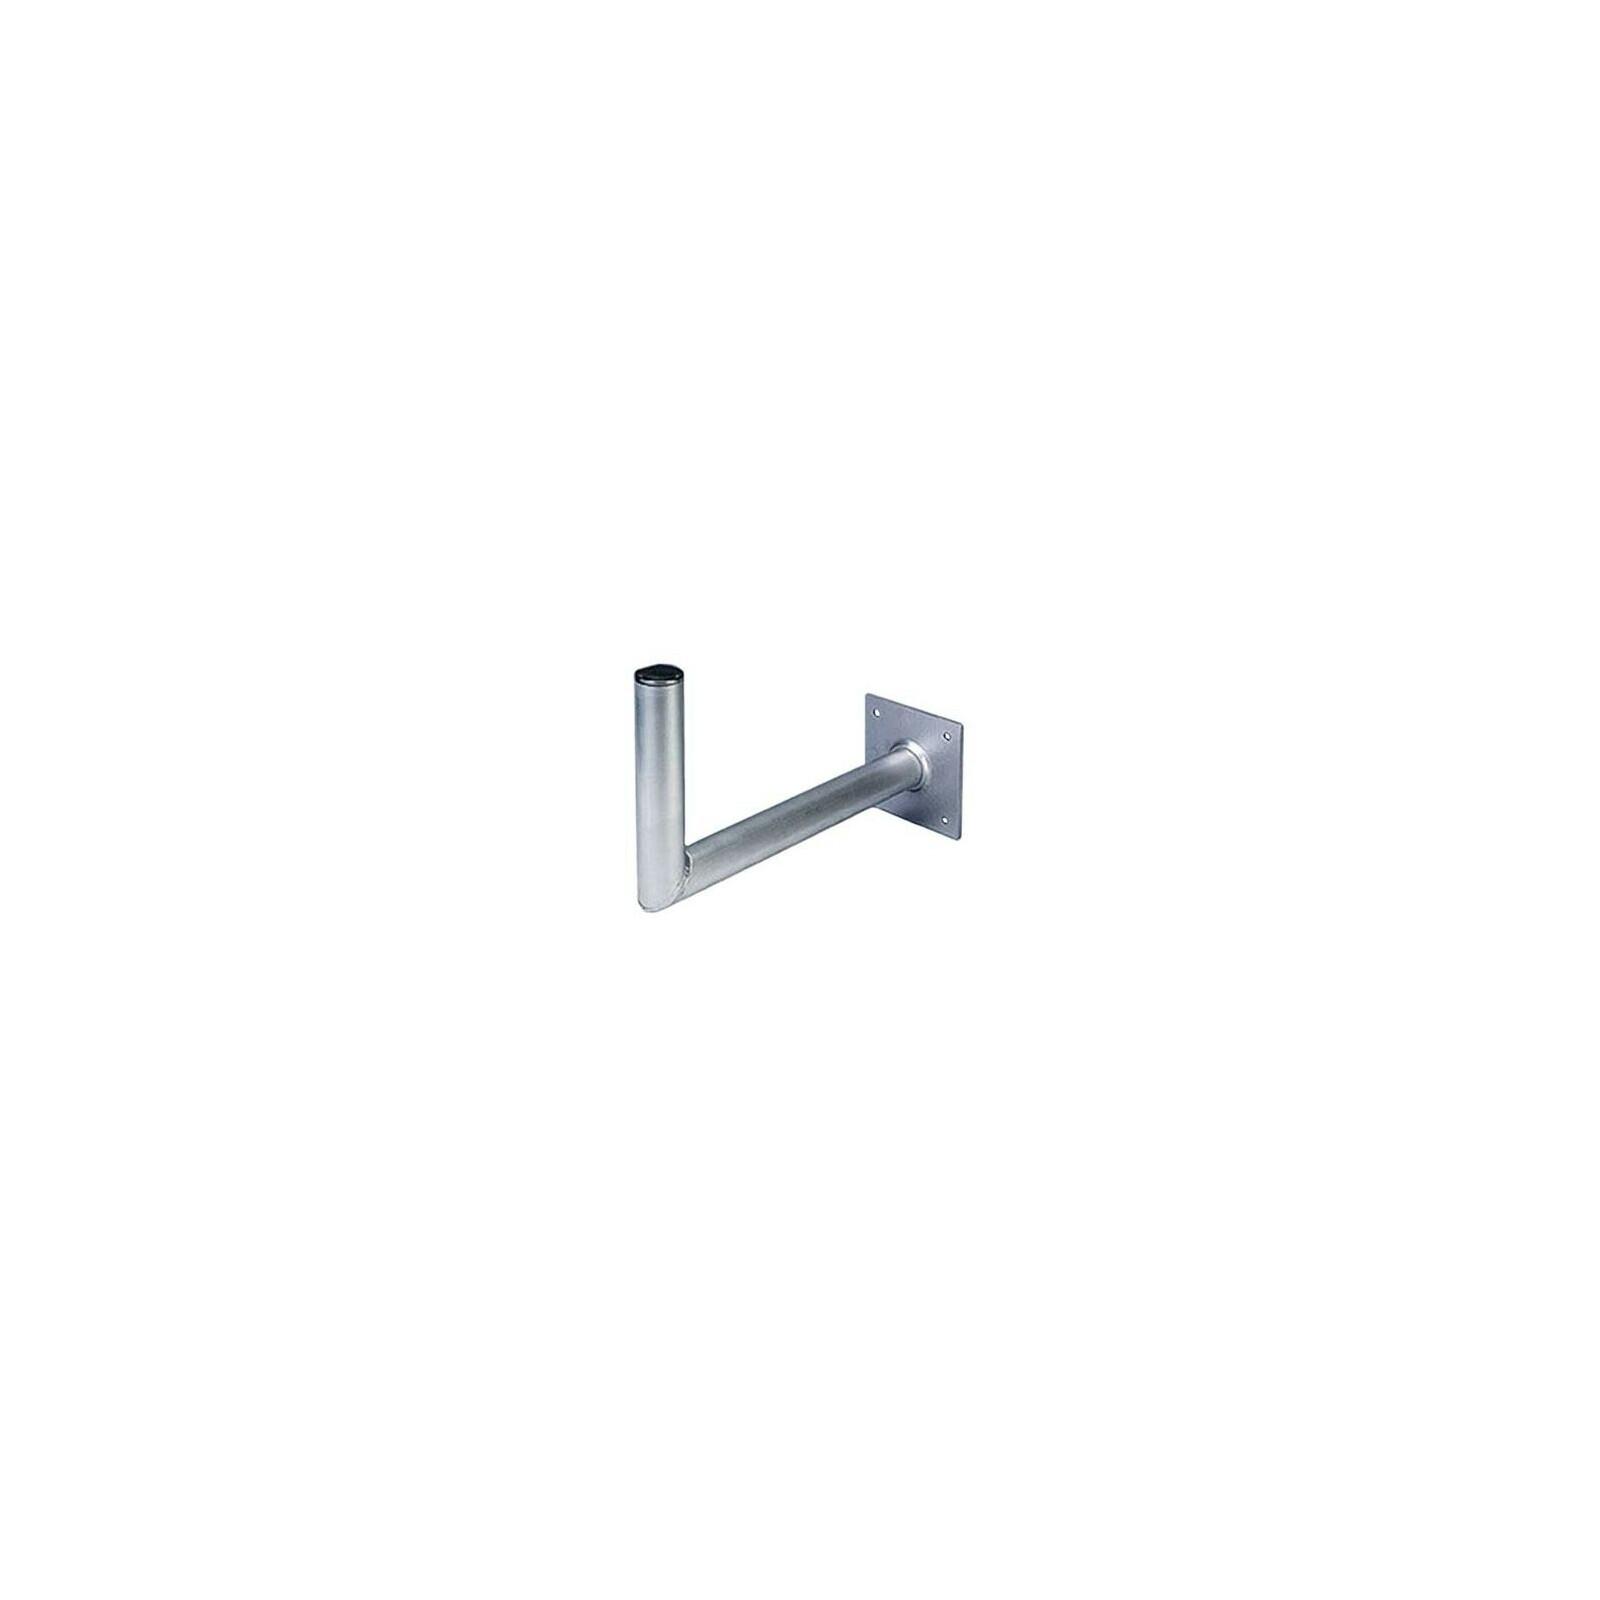 Hama 44183 SAT-Wandhalterung aus Aluminium, 45 cm Wandabstan